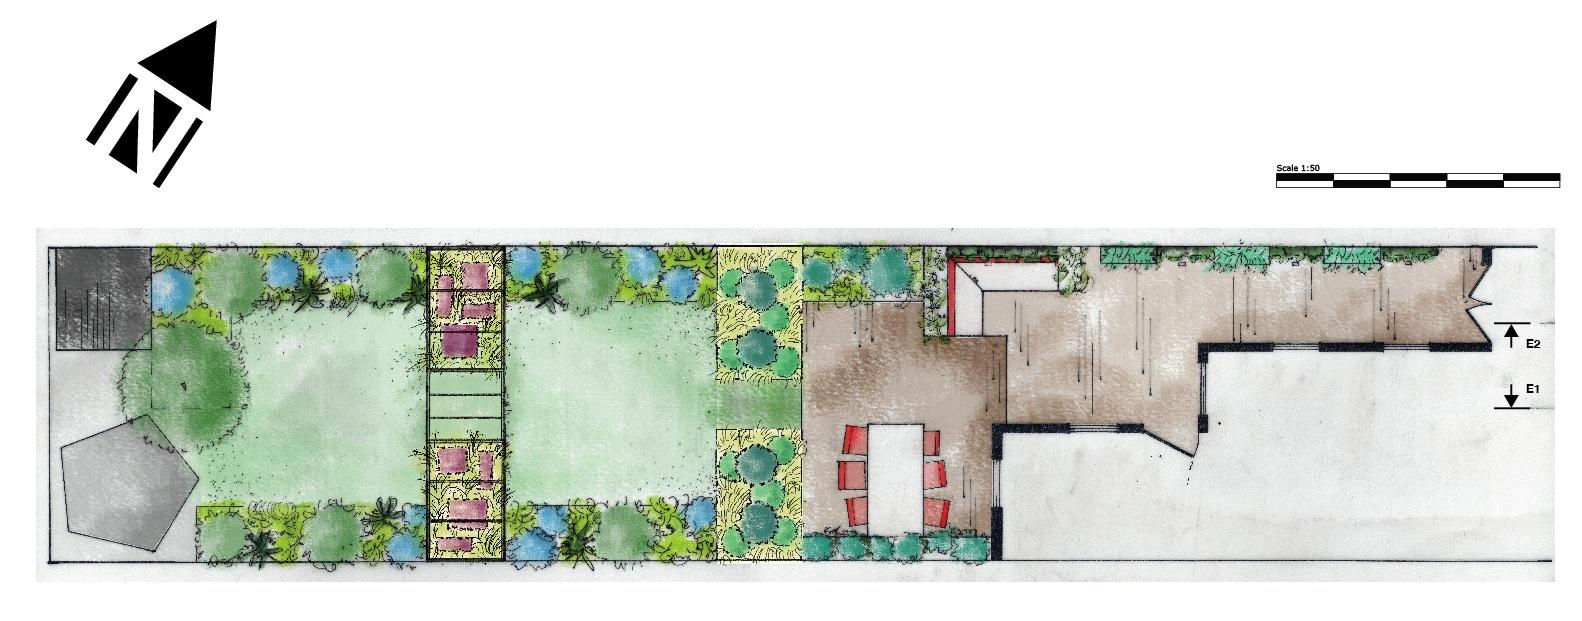 Hainthorpe Rd Masterplan